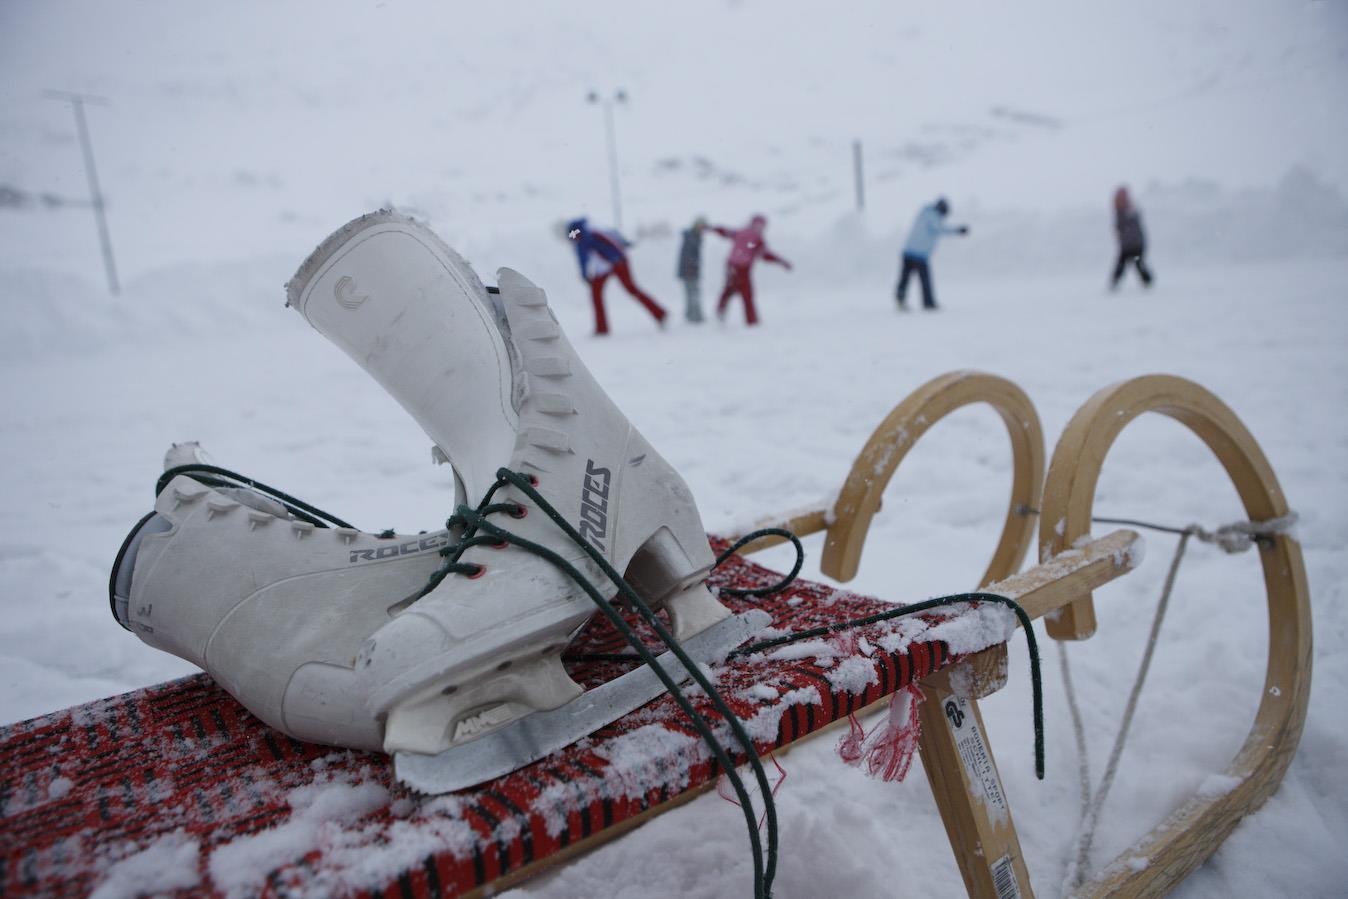 Ice rink in S. Martino in Passiria / St. Martin in Passeier